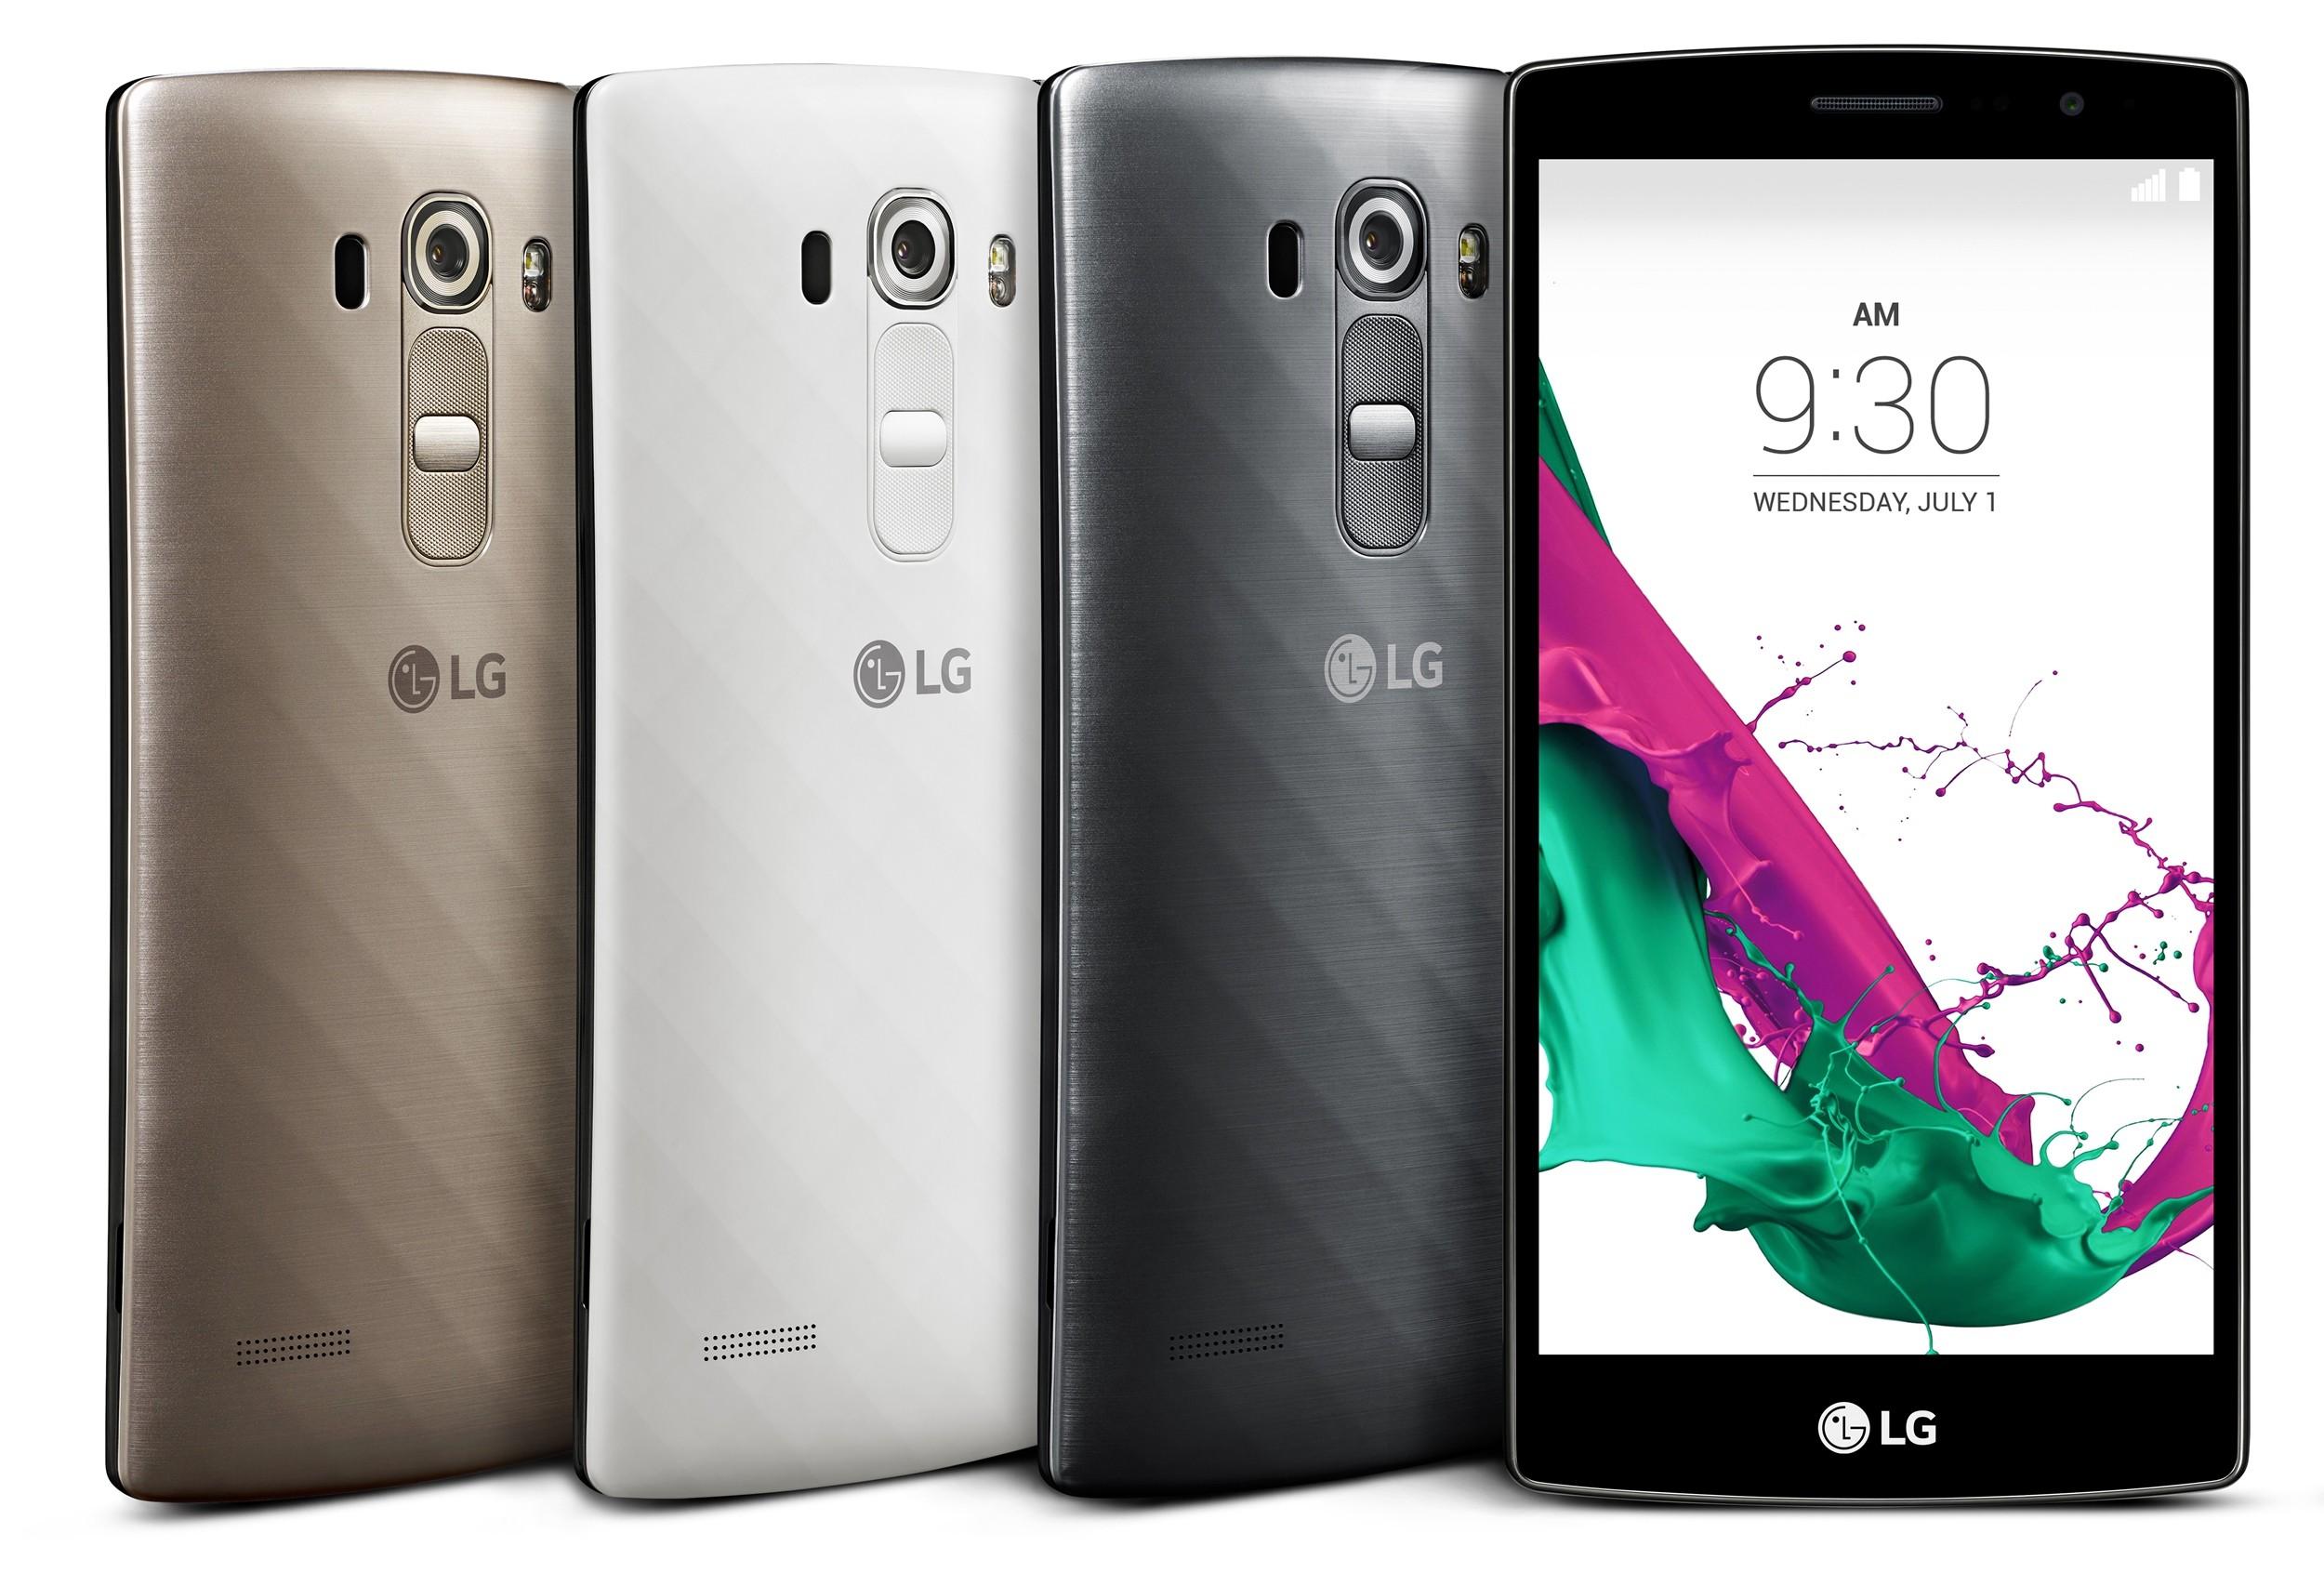 LG G4 scontato